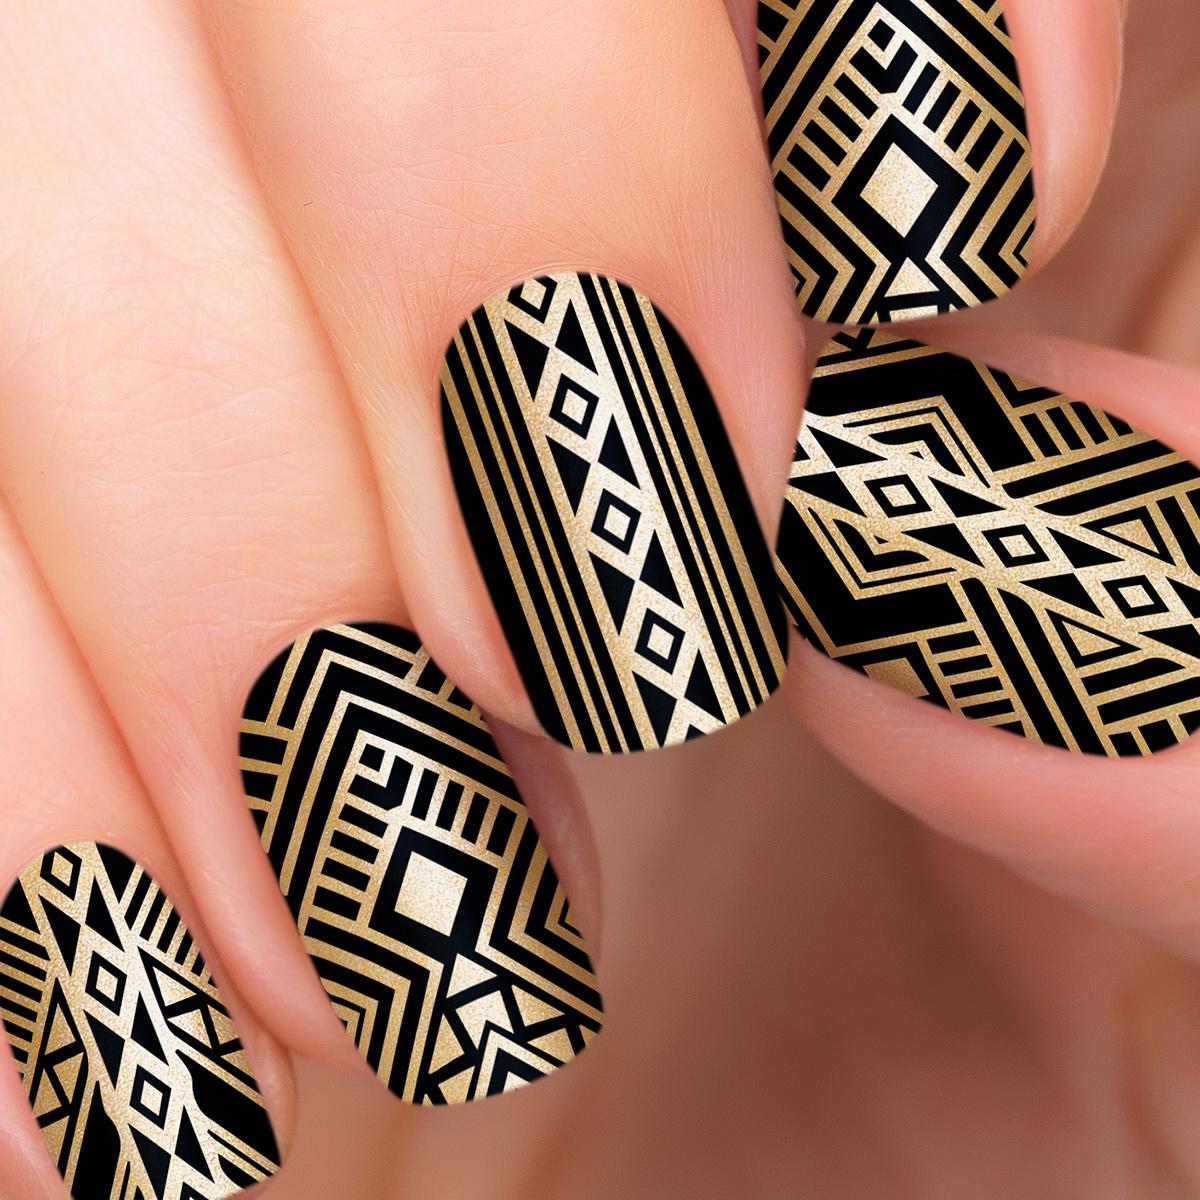 Incoco.com Incoco Nail Polish Strips, Gatsby